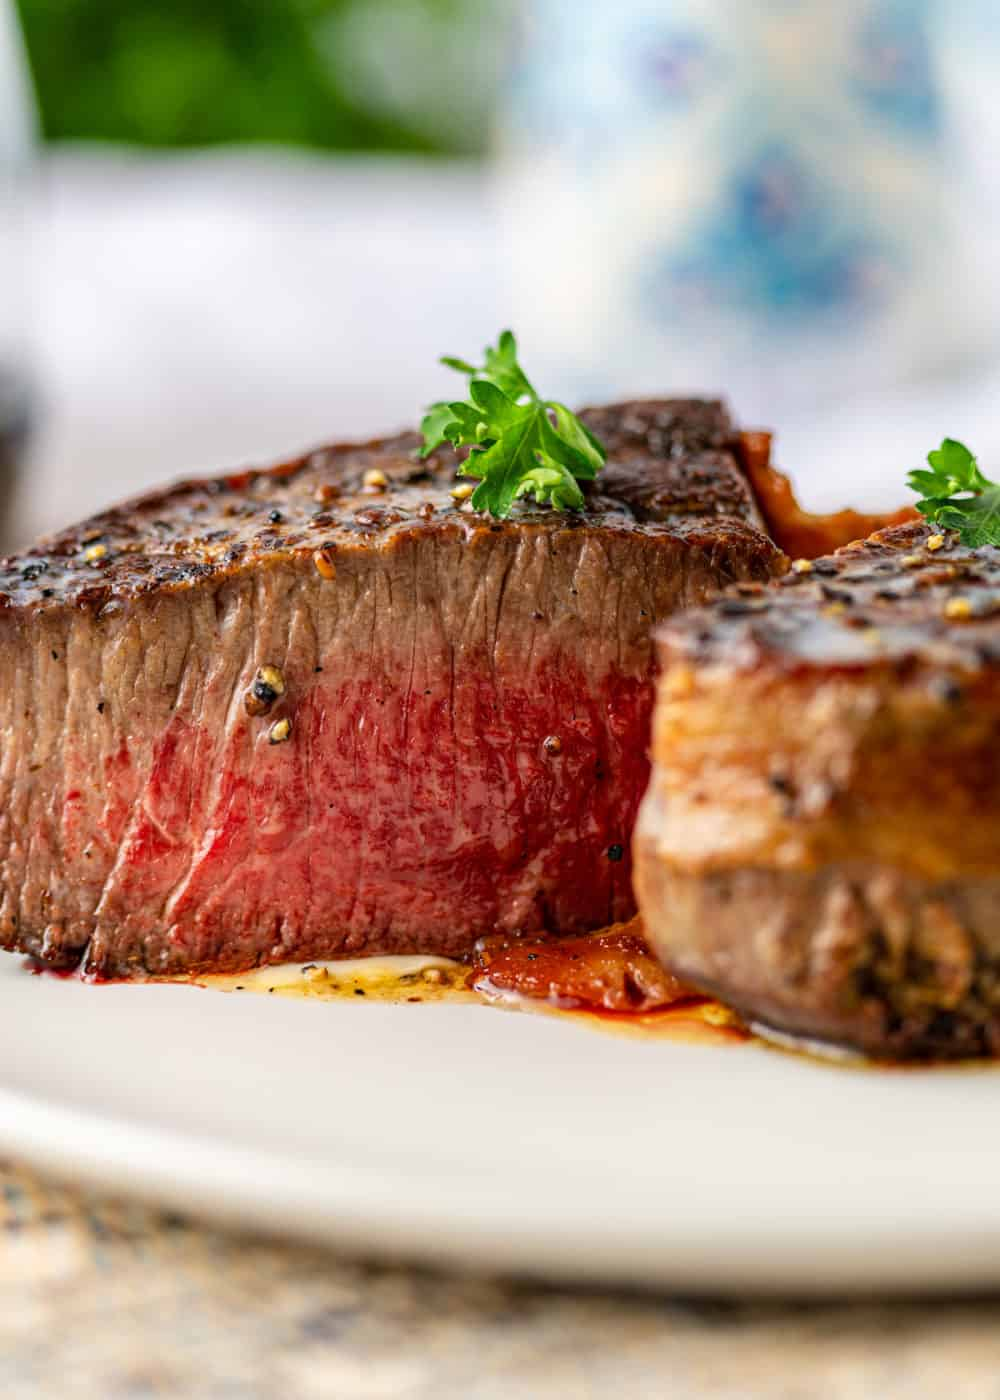 medium rare steak sliced exposing the center